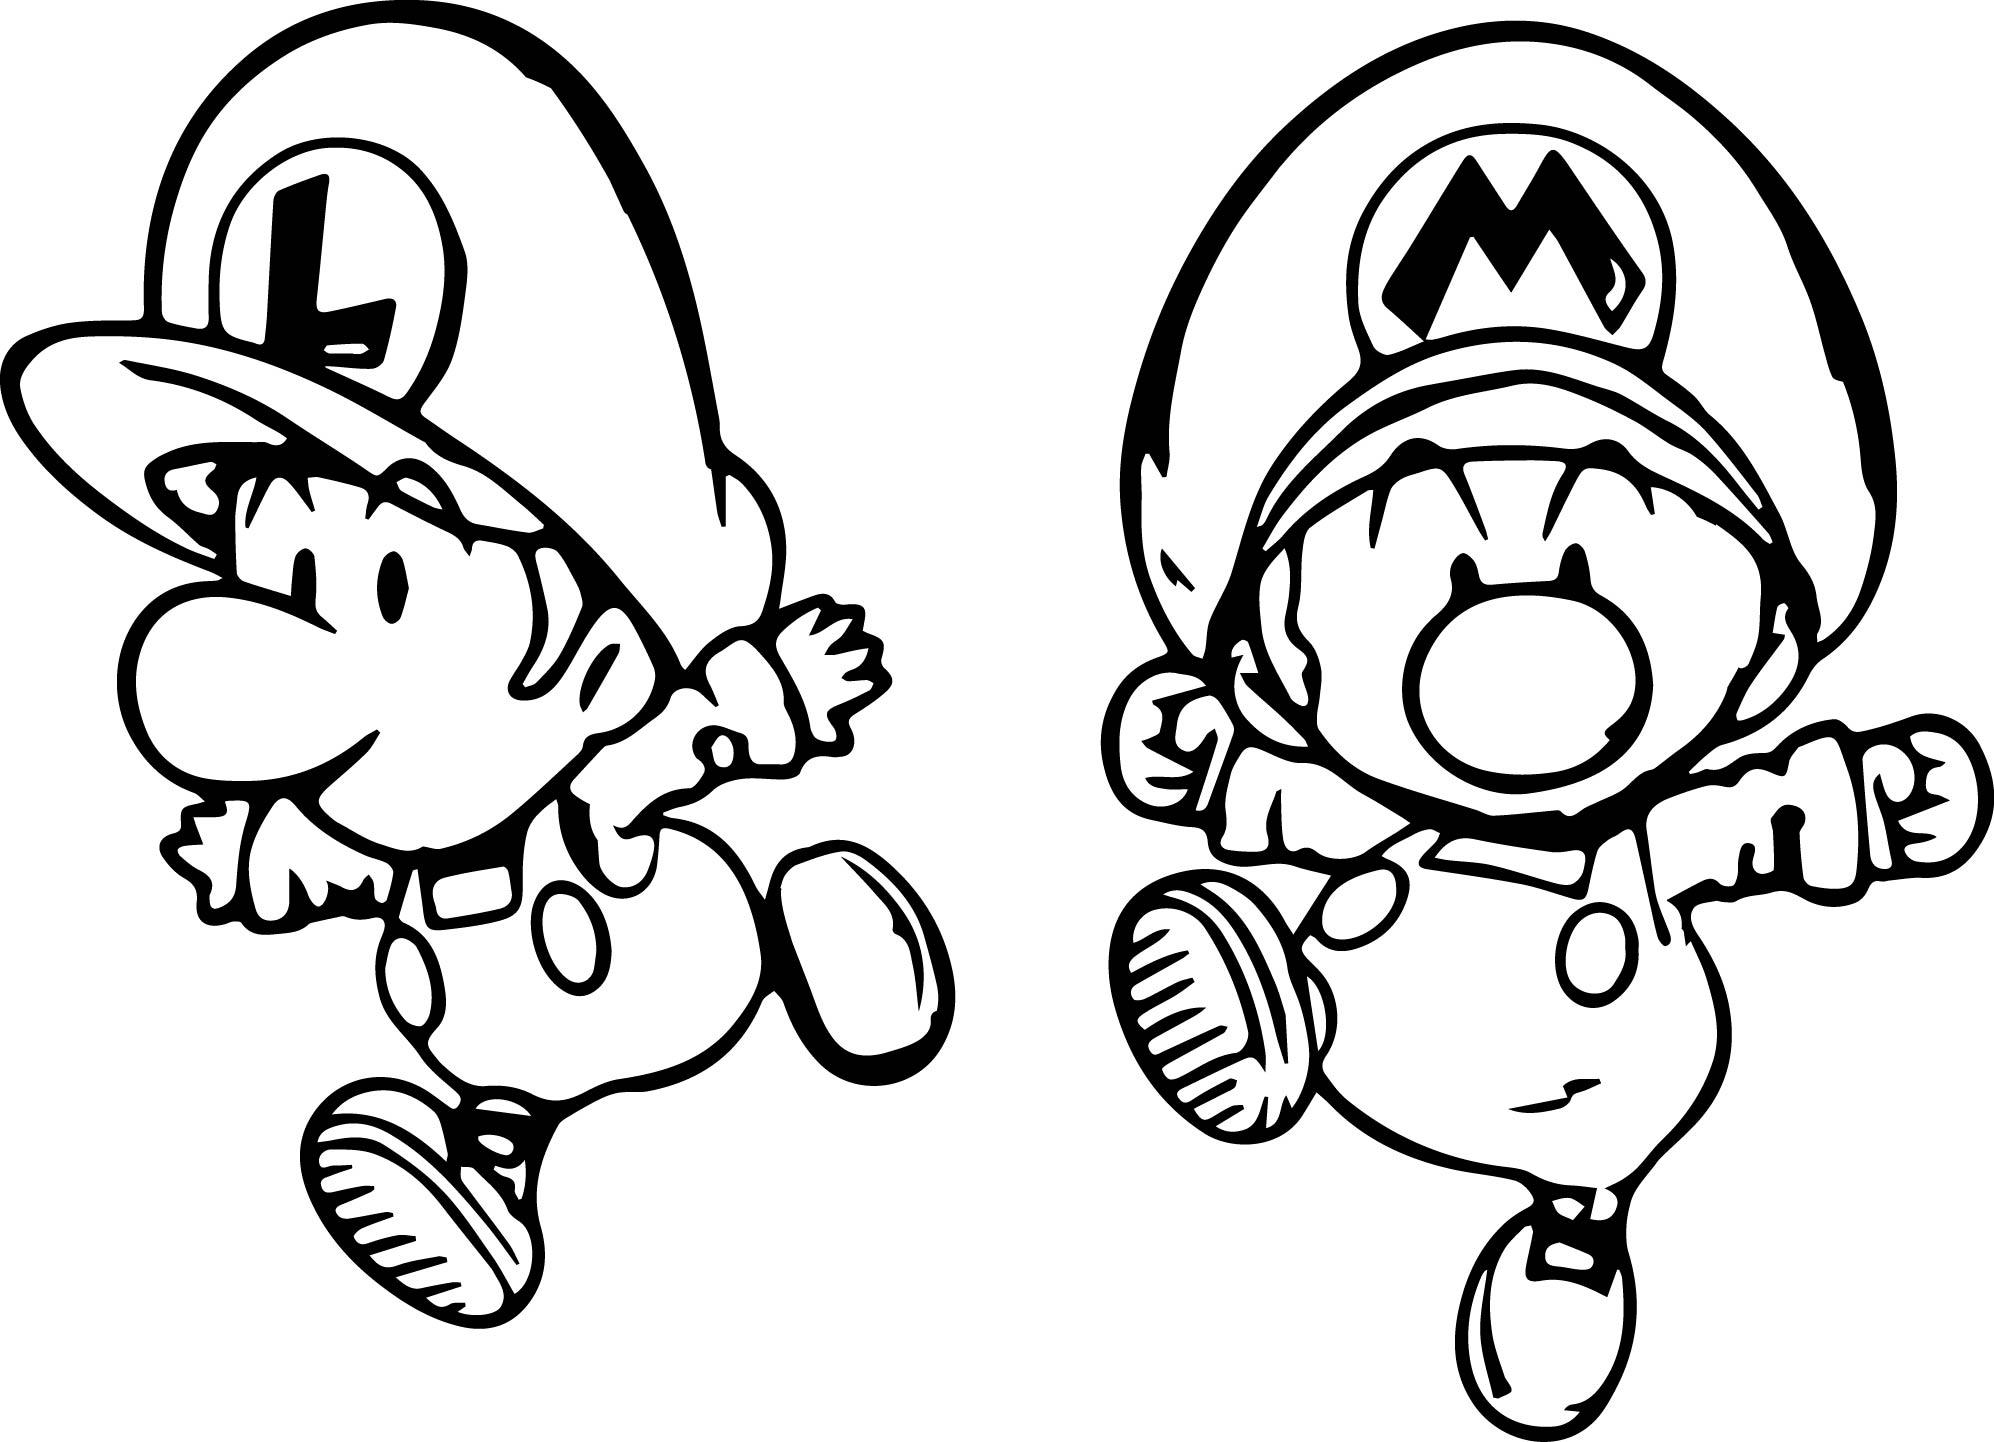 Baby Mario Drawing at GetDrawings | Free download